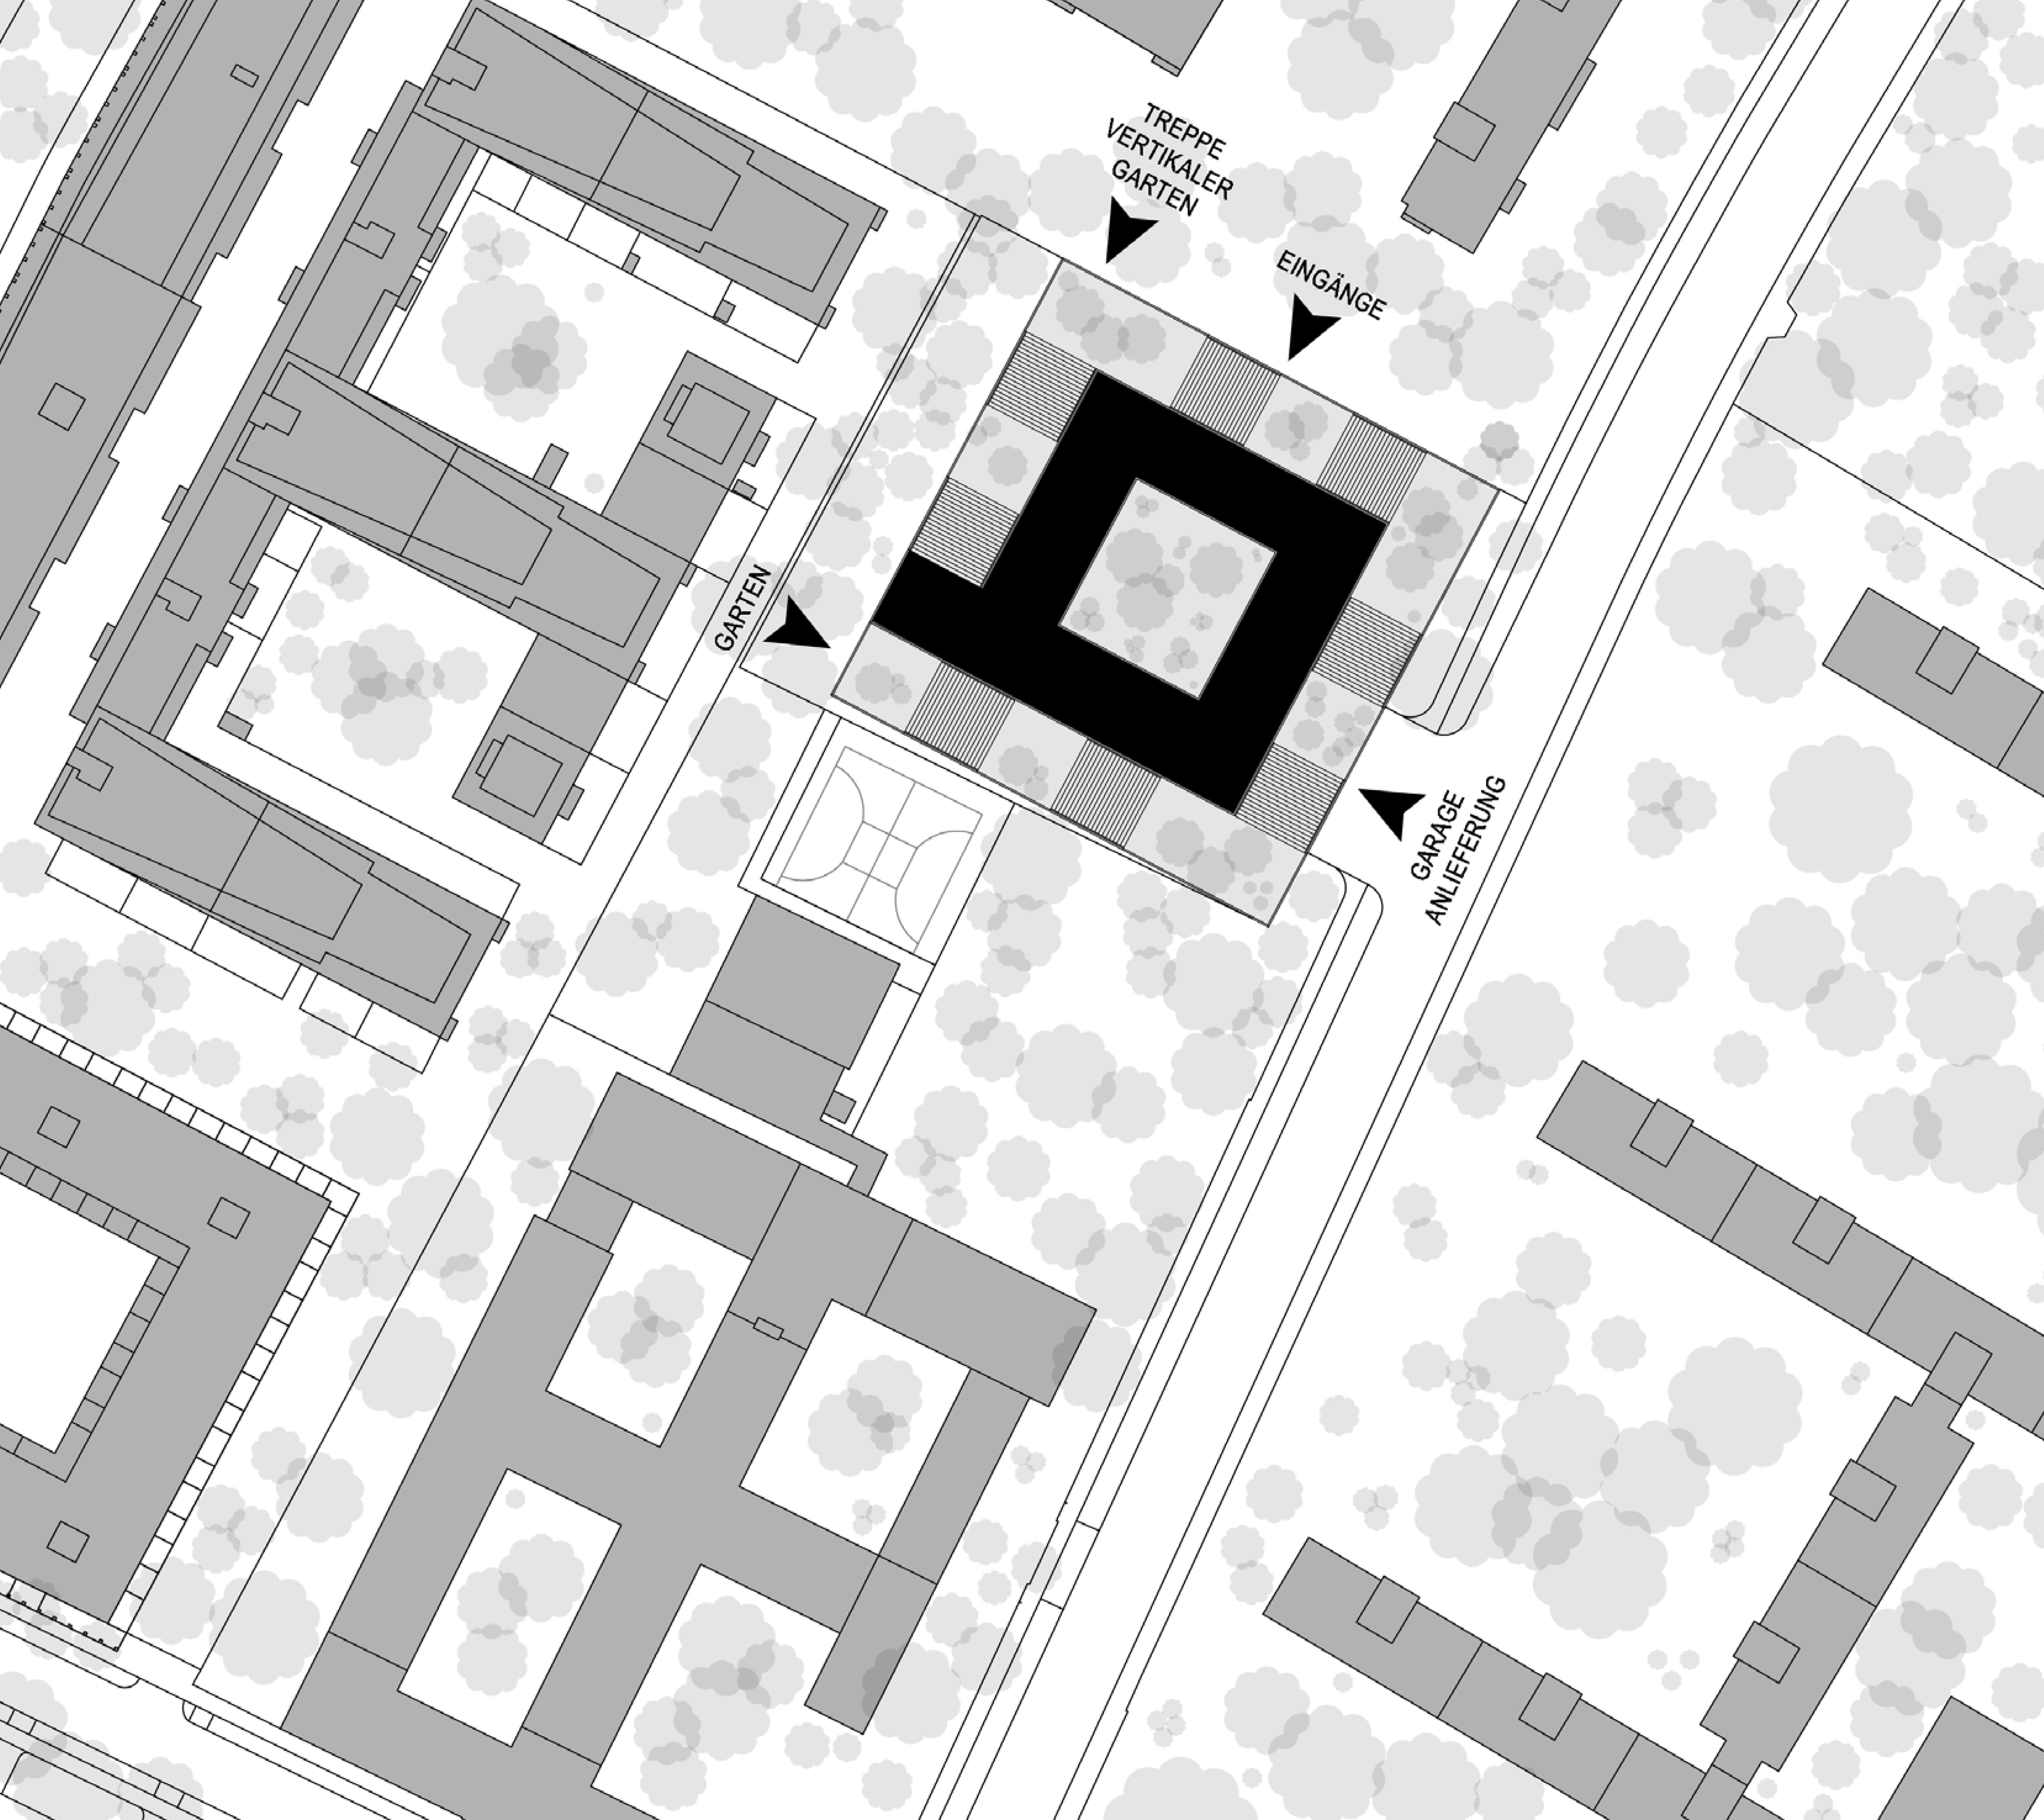 01_Site Plan